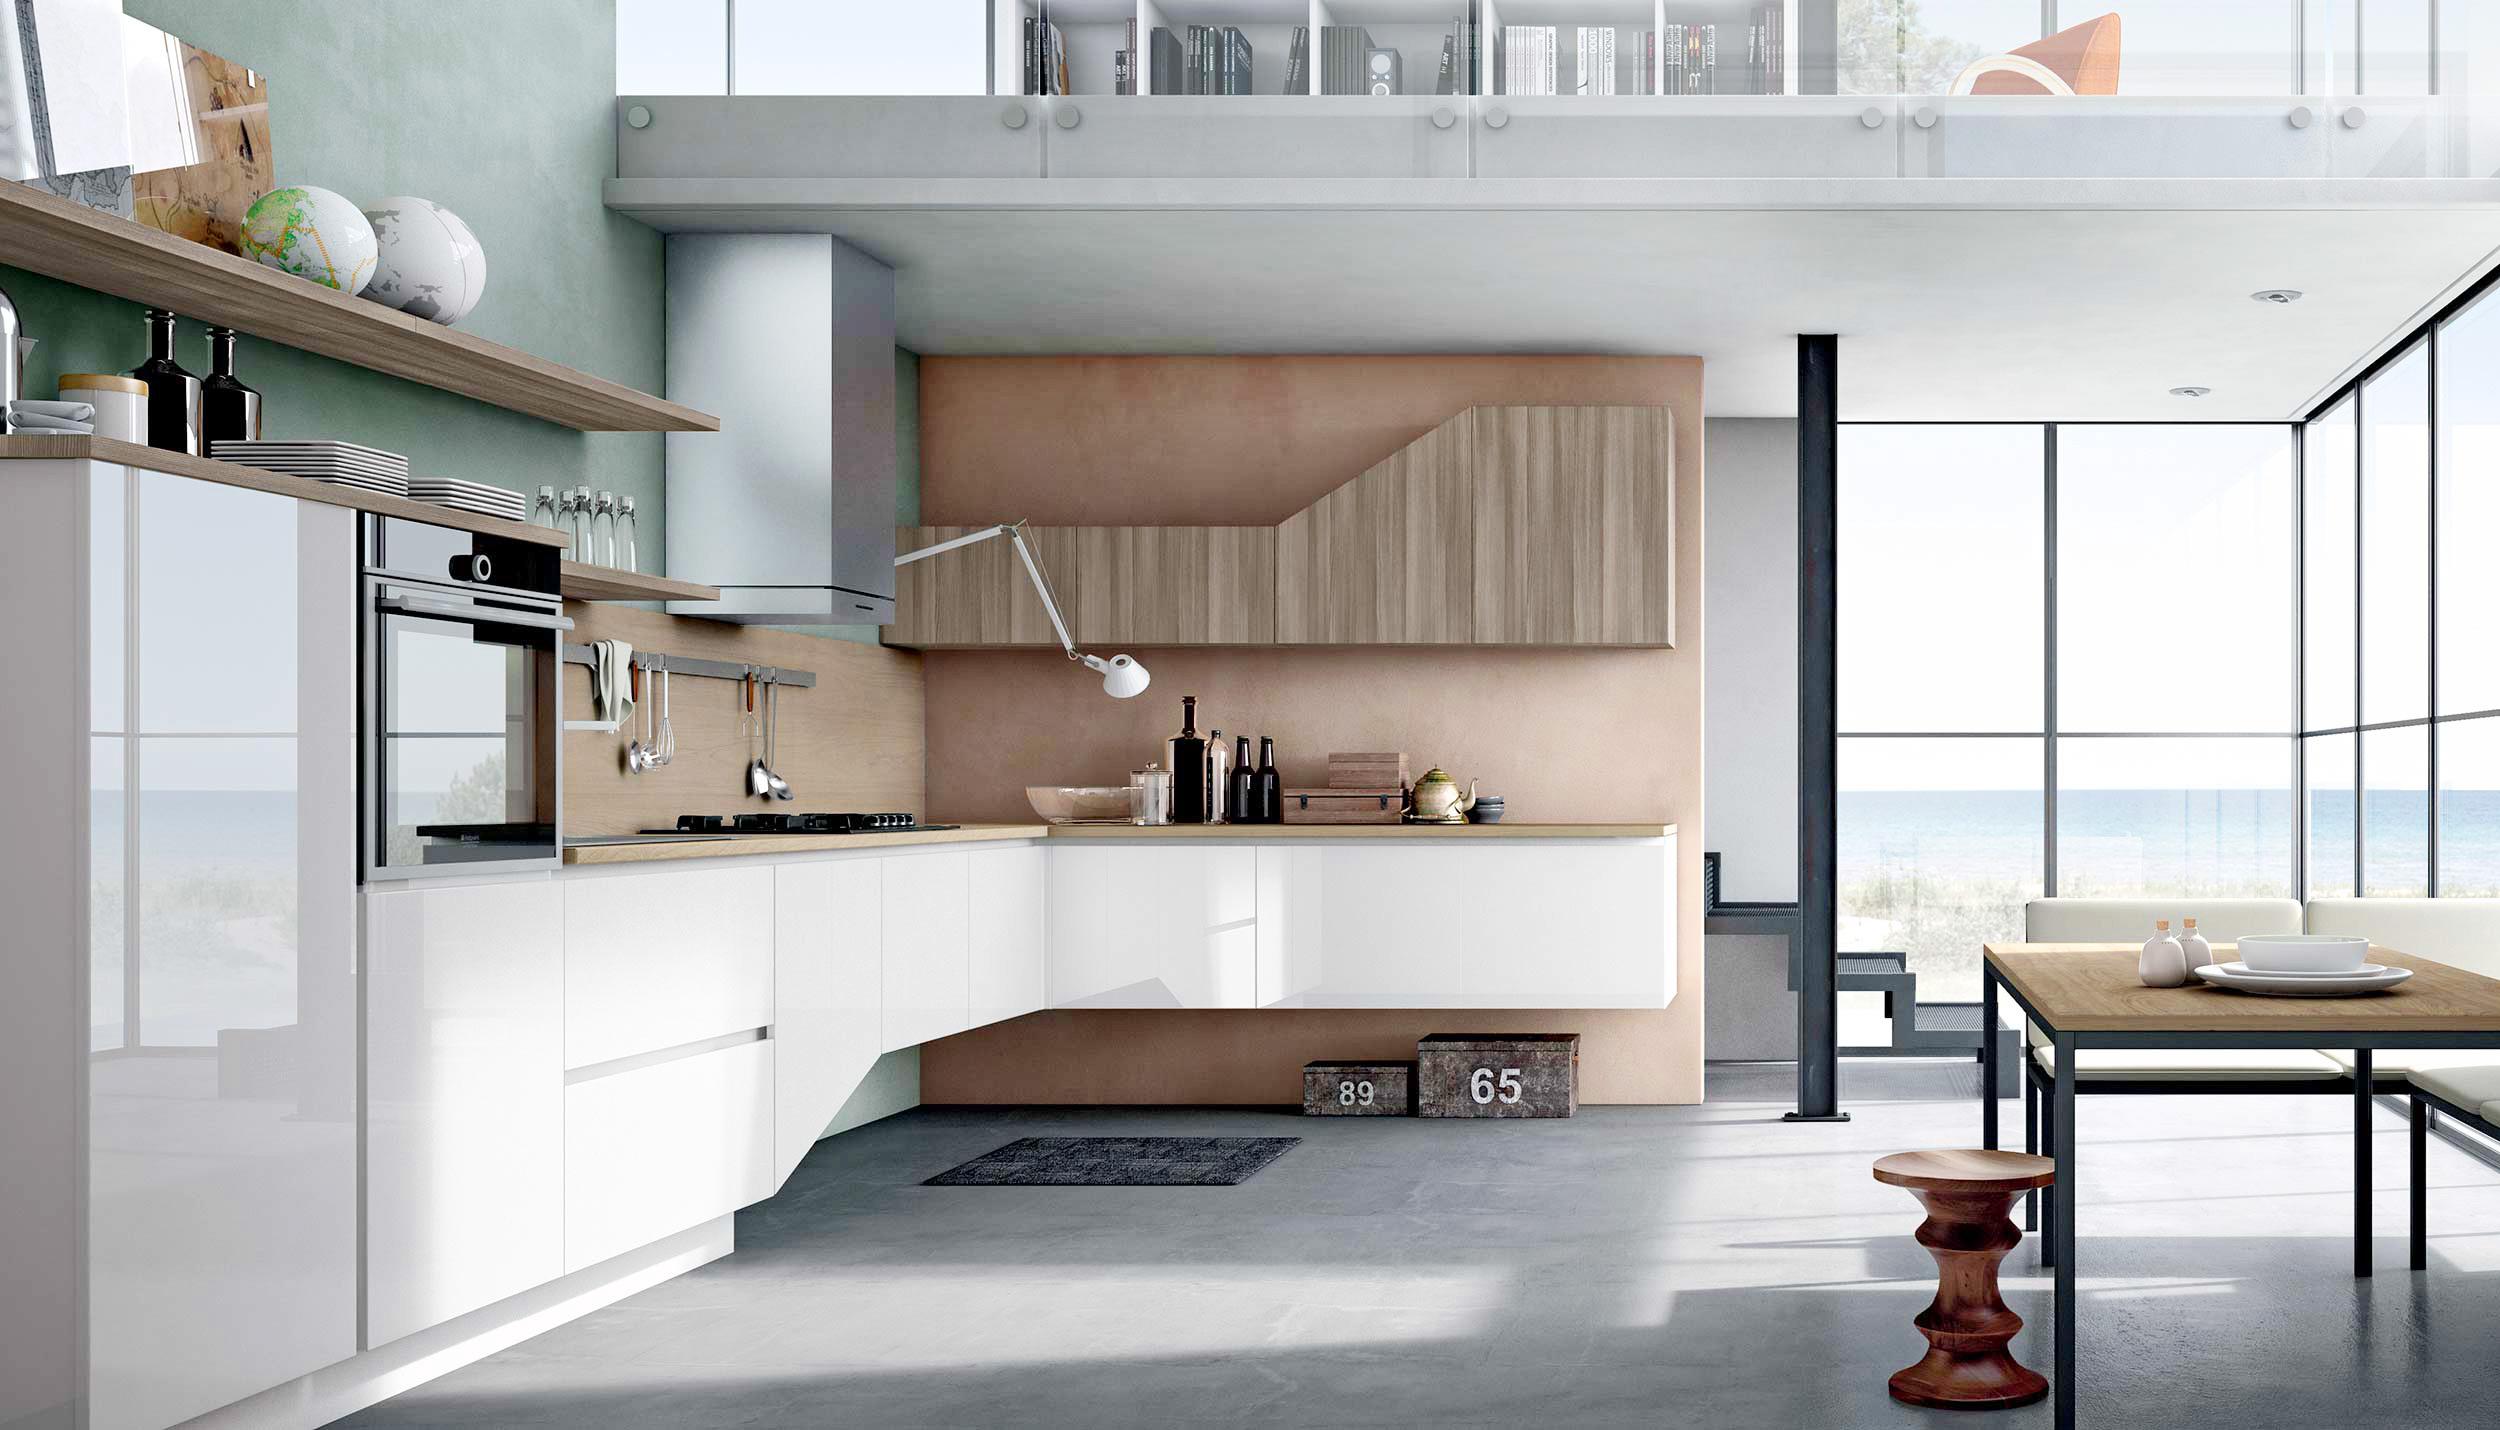 Cucine Tedesche Bulthaup - Idee Per La Casa - Syafir.com